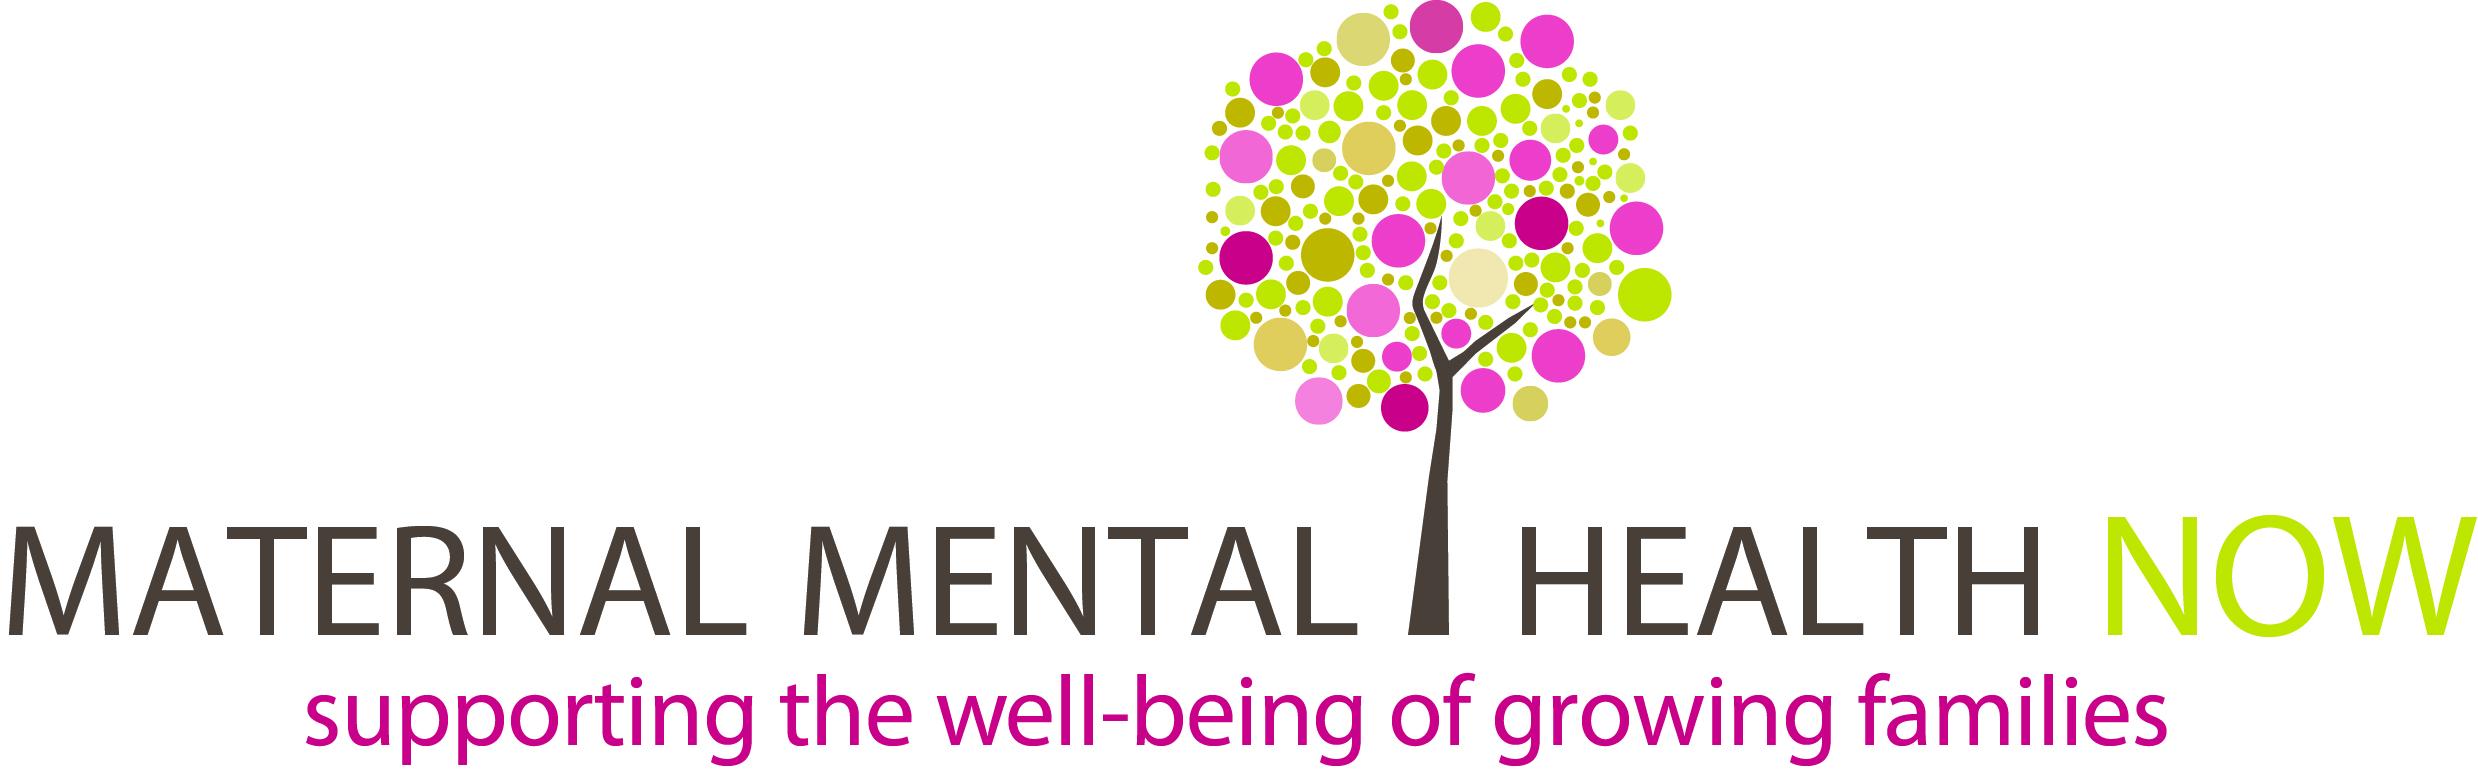 Free downloadable poster- Maternal Mental Health 2021 - PraeclarusPress